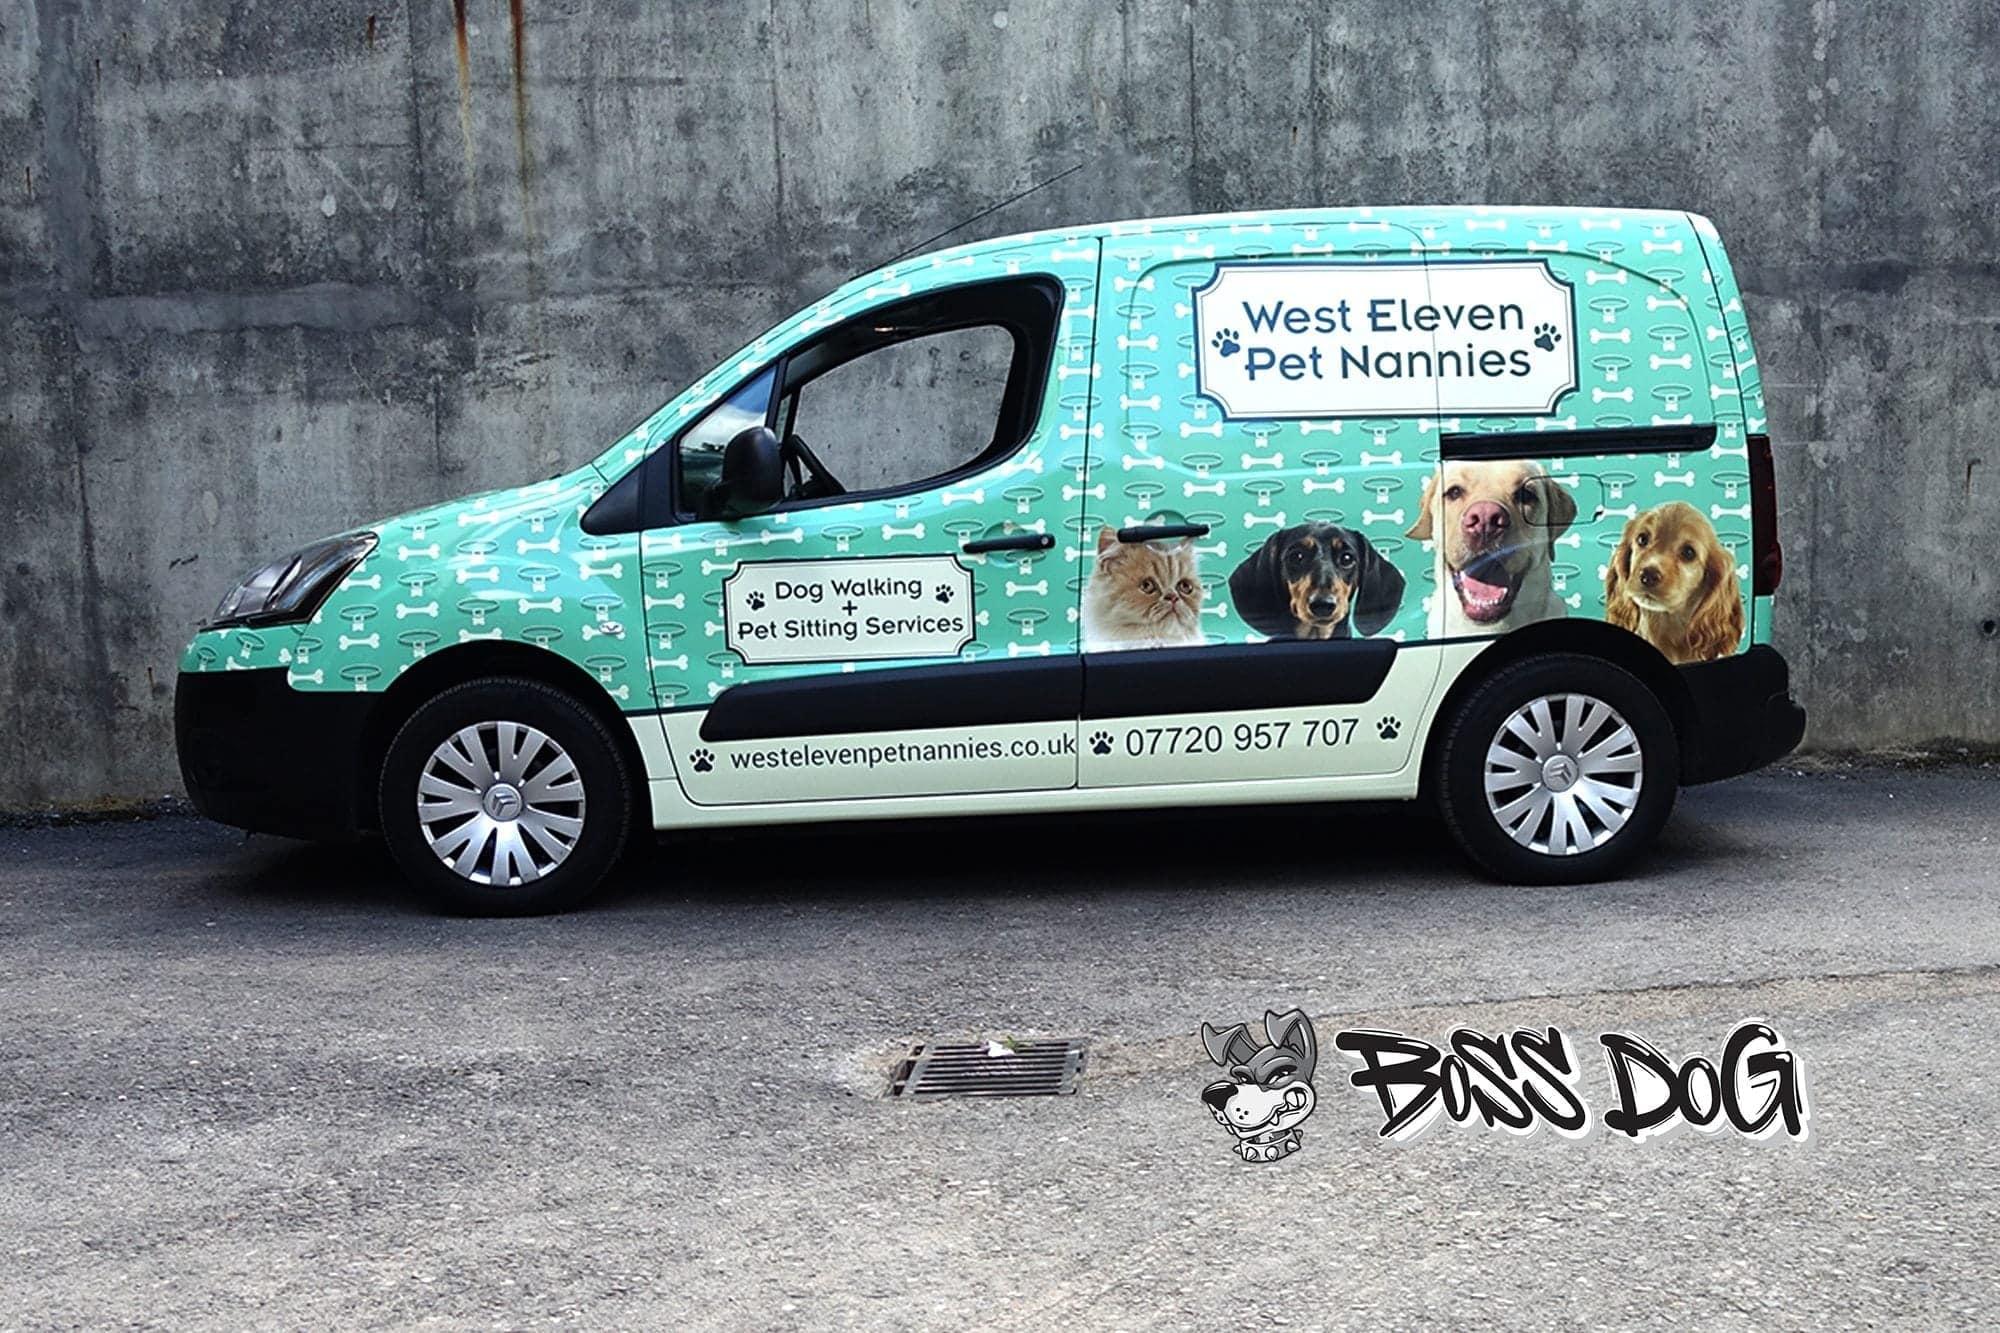 Citreon Berlingo commercial full wrap digital print for West Eleven Pet Nannies